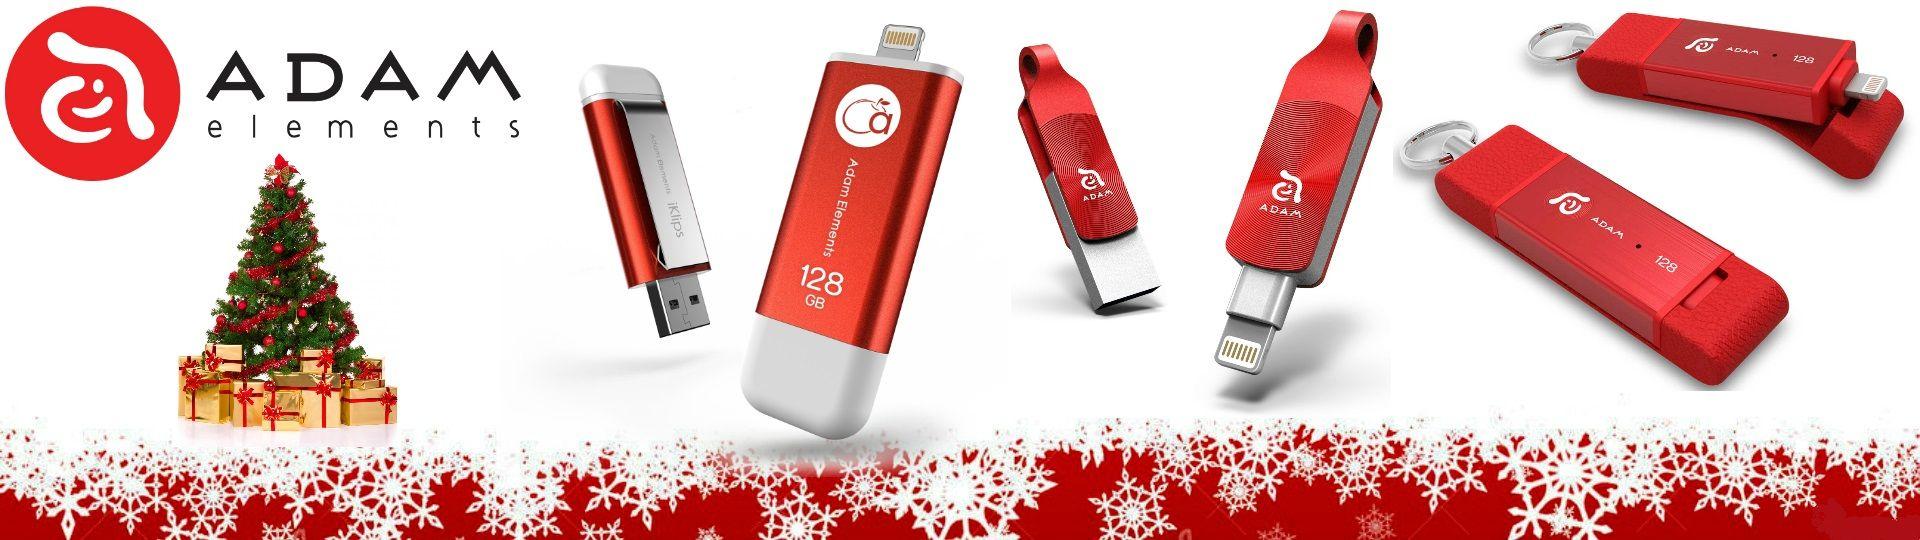 Adam Elements Christmas Treat Electronics Gadgets Pinterest Element Iklips Flash Drive 128gb Red